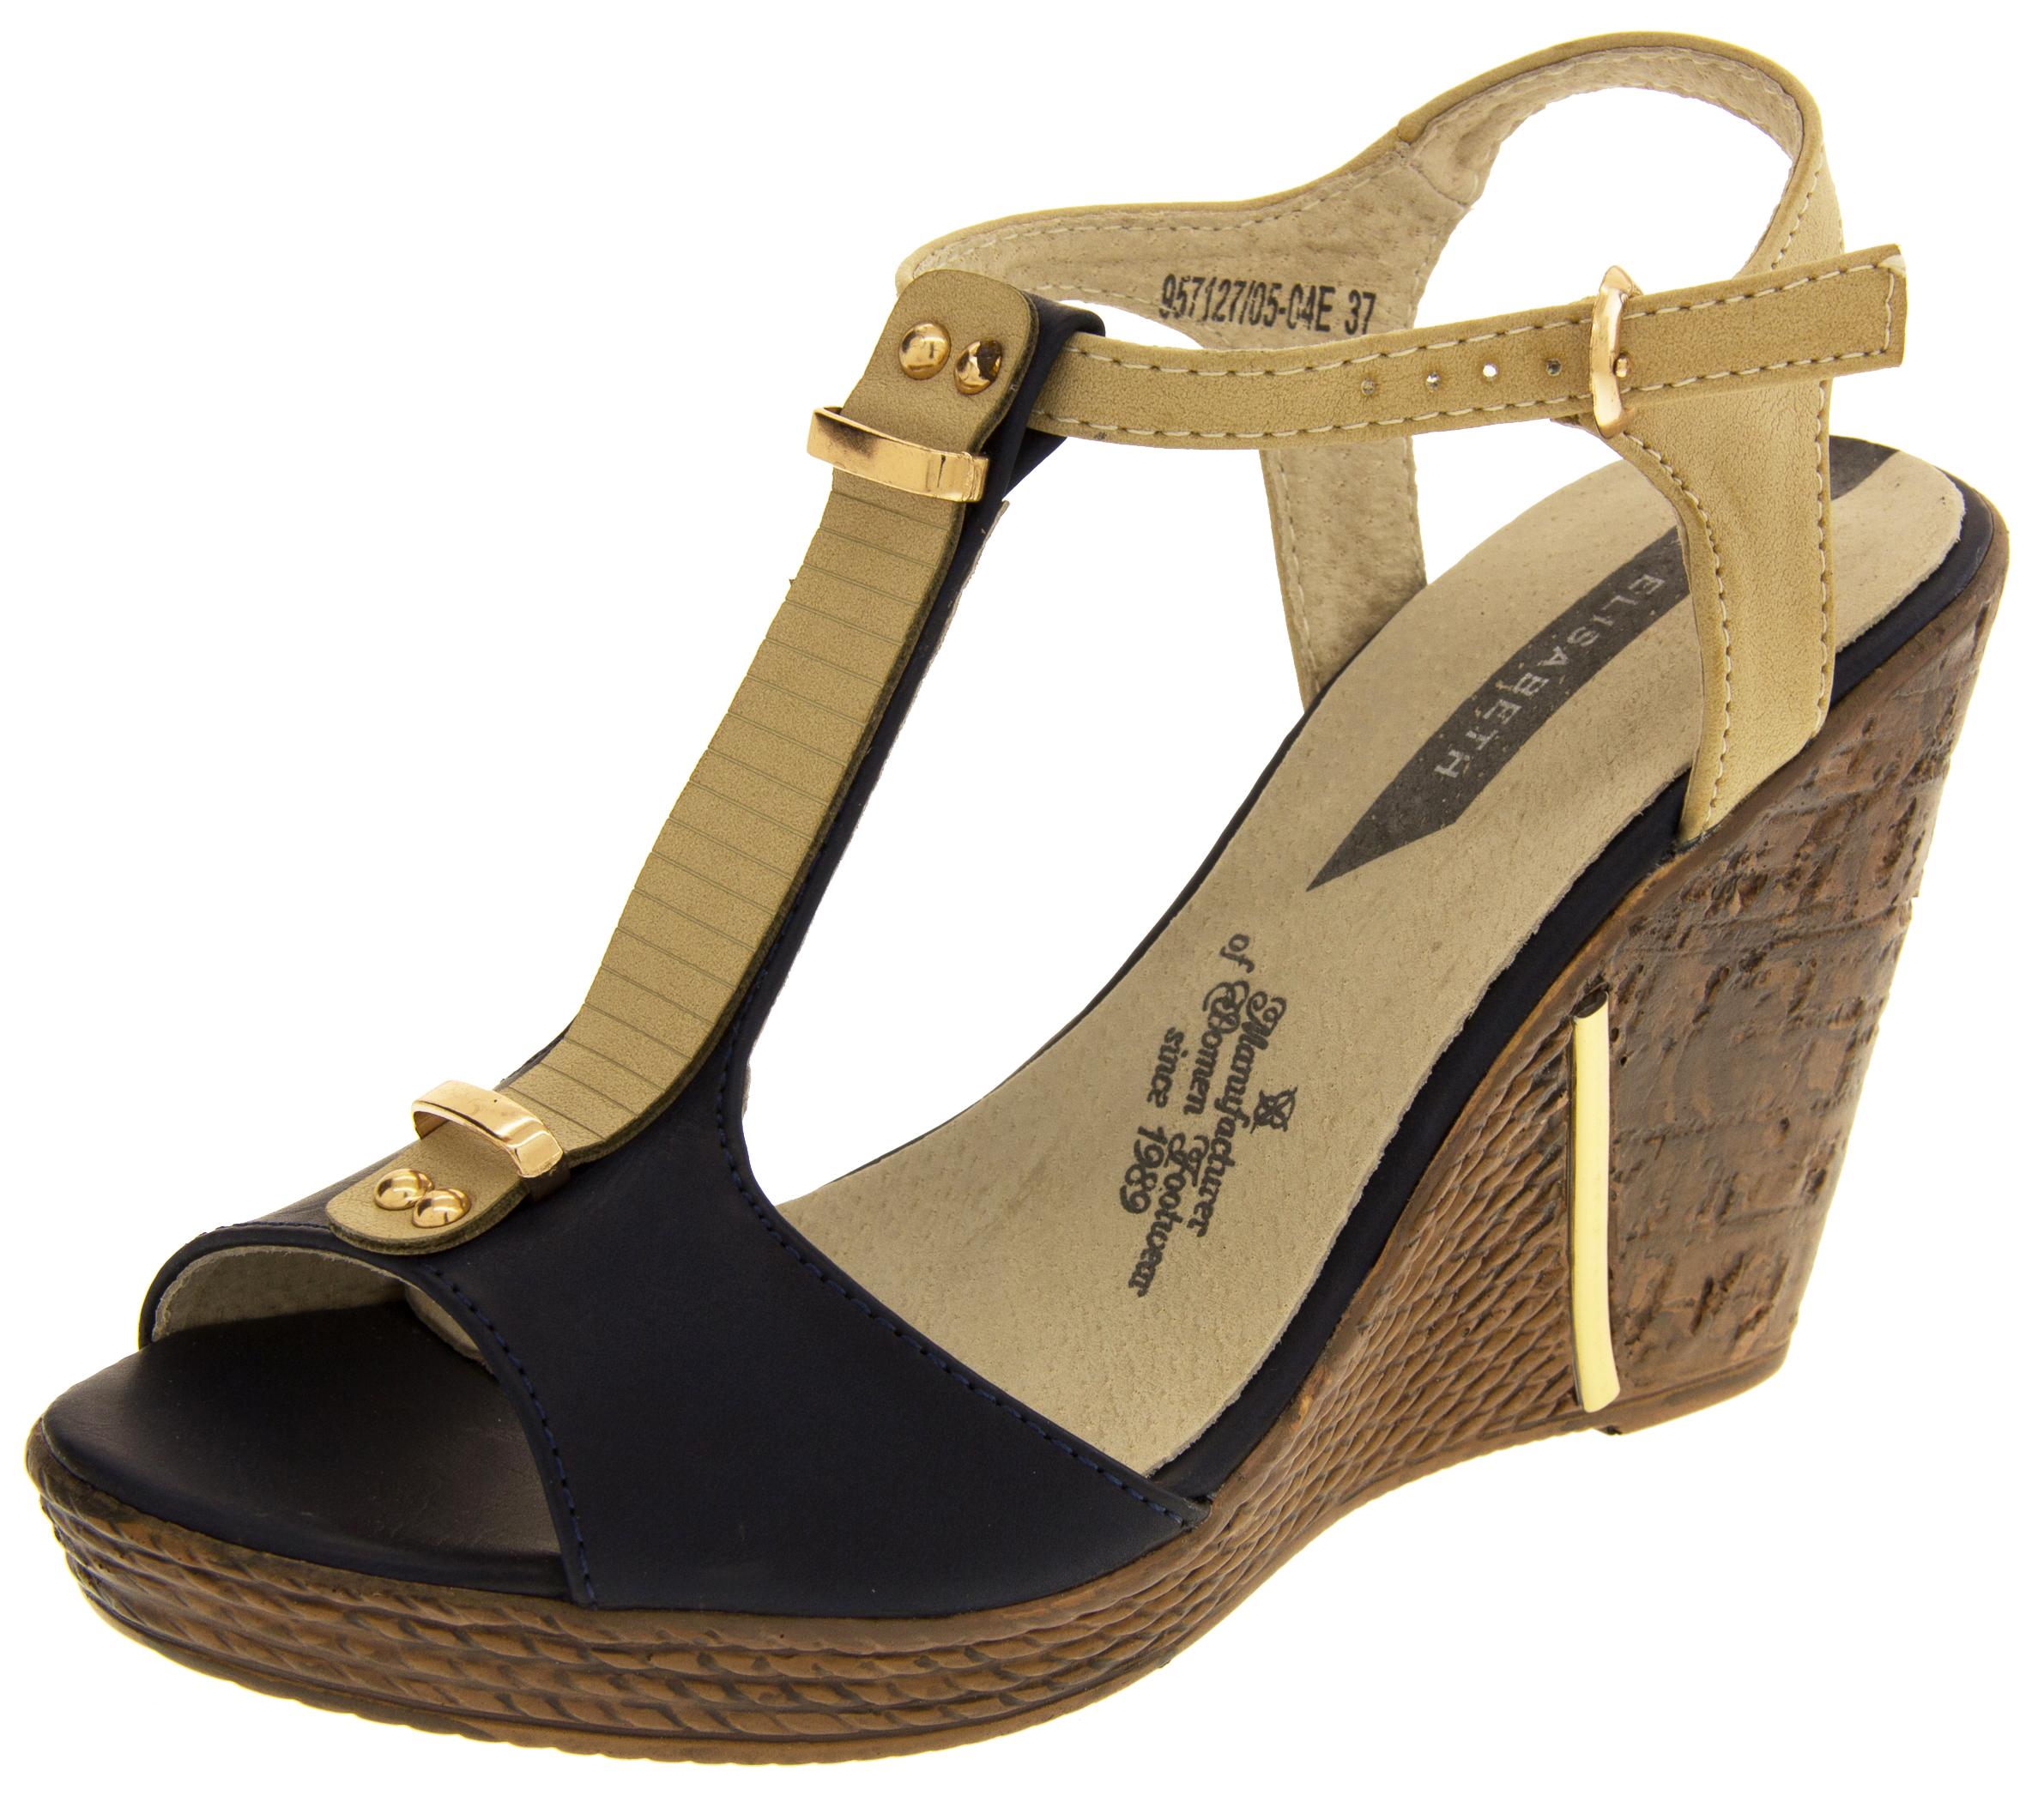 8ab459790c1a3 Womens Wedge High Heel Platform Strappy Sandals